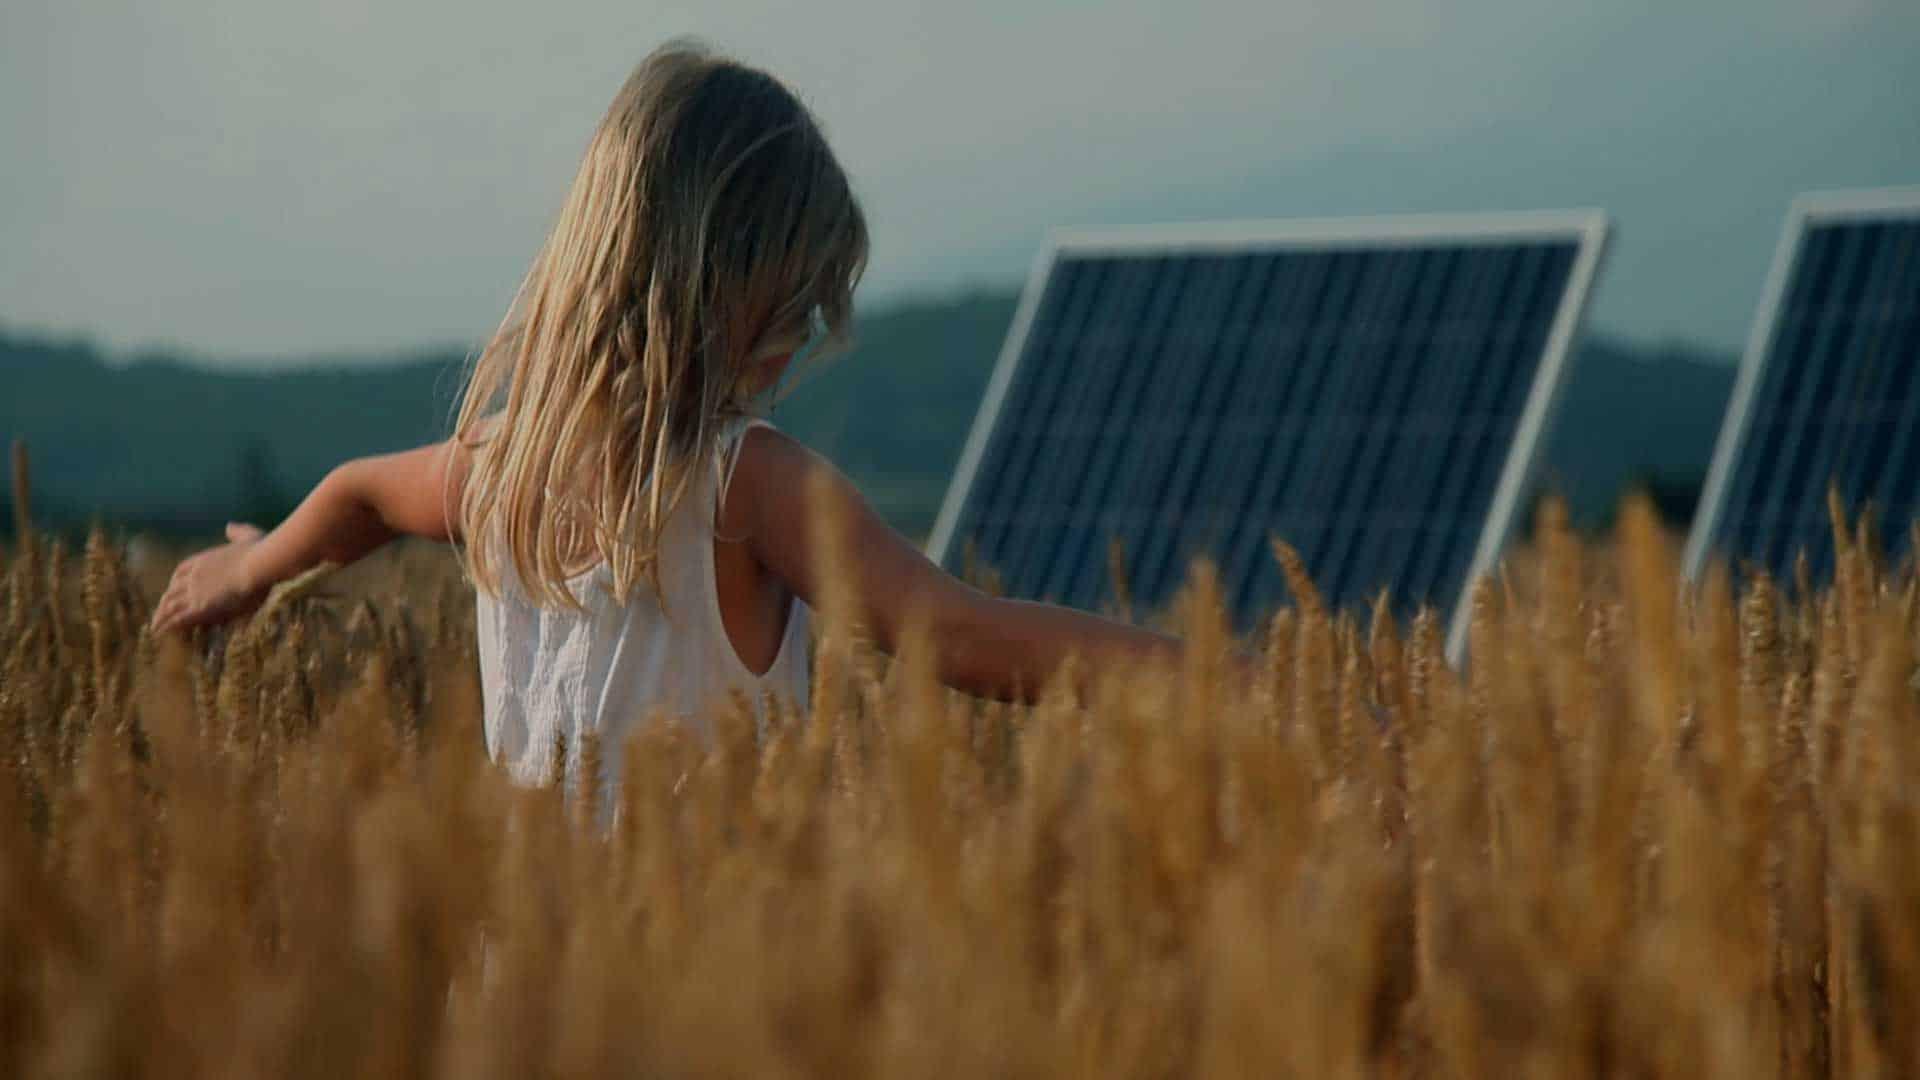 Bewegtbildproduktion Photovoltaik bei VORSATZ.MEDIA